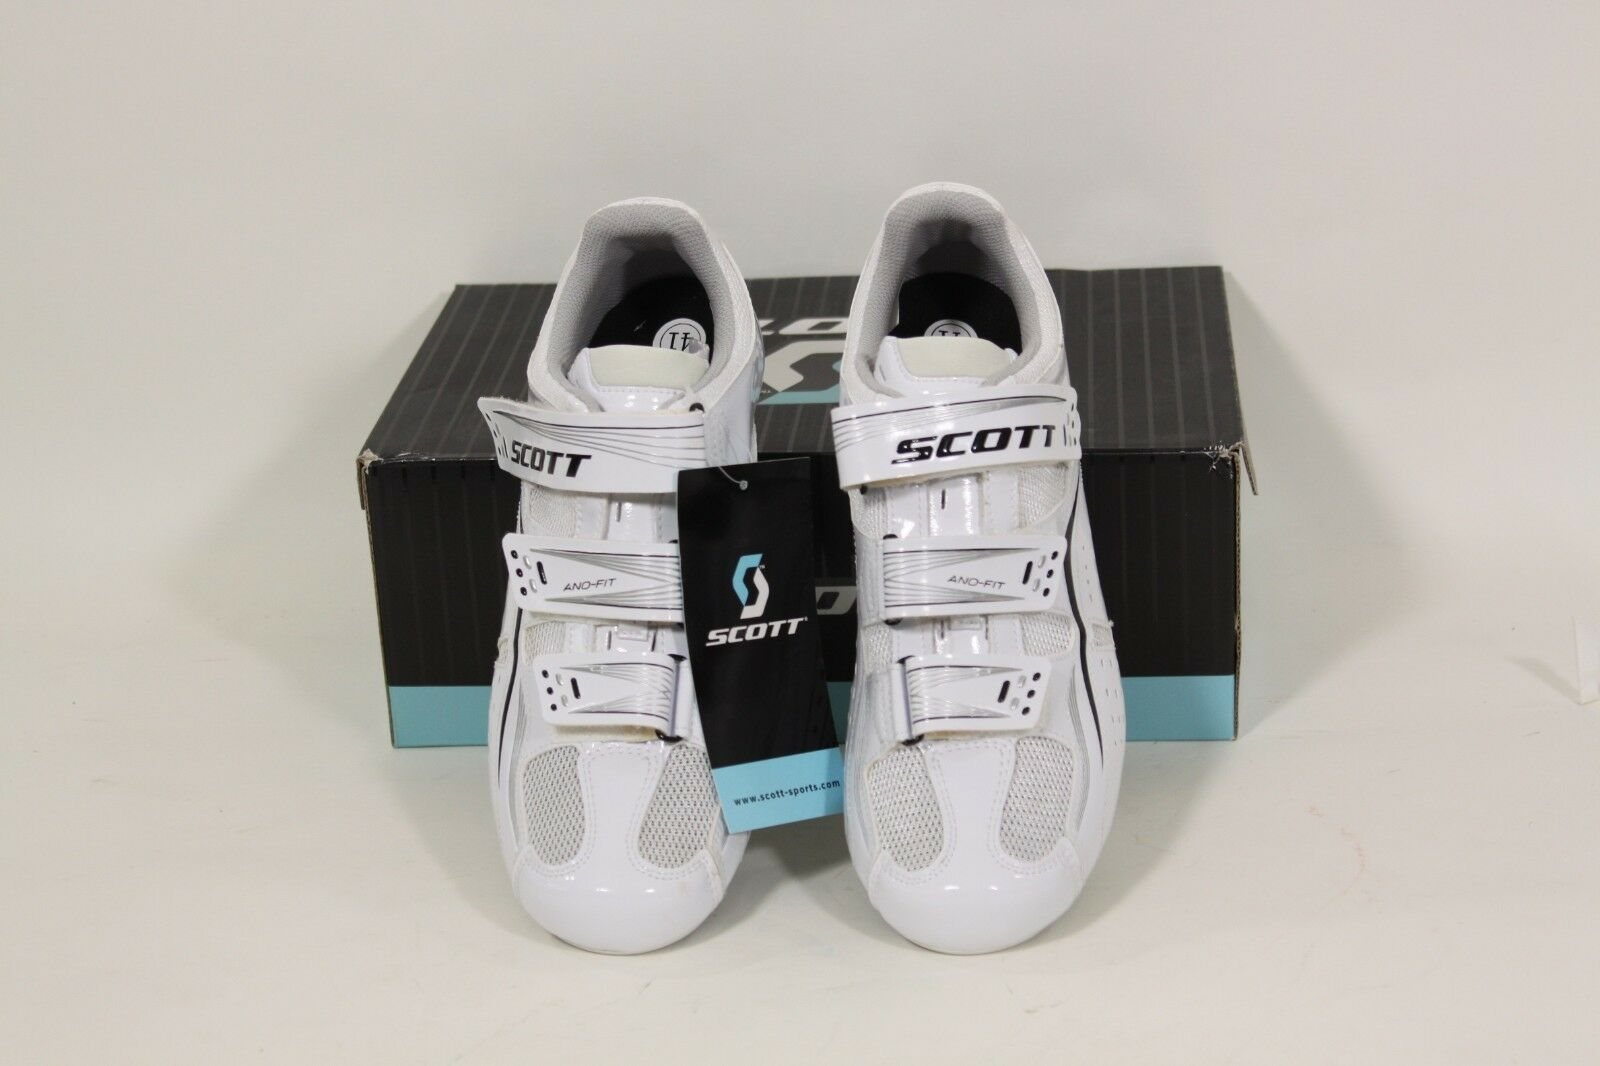 Scott Road Comp Lady Bike shoes White Eu 40 or US 8